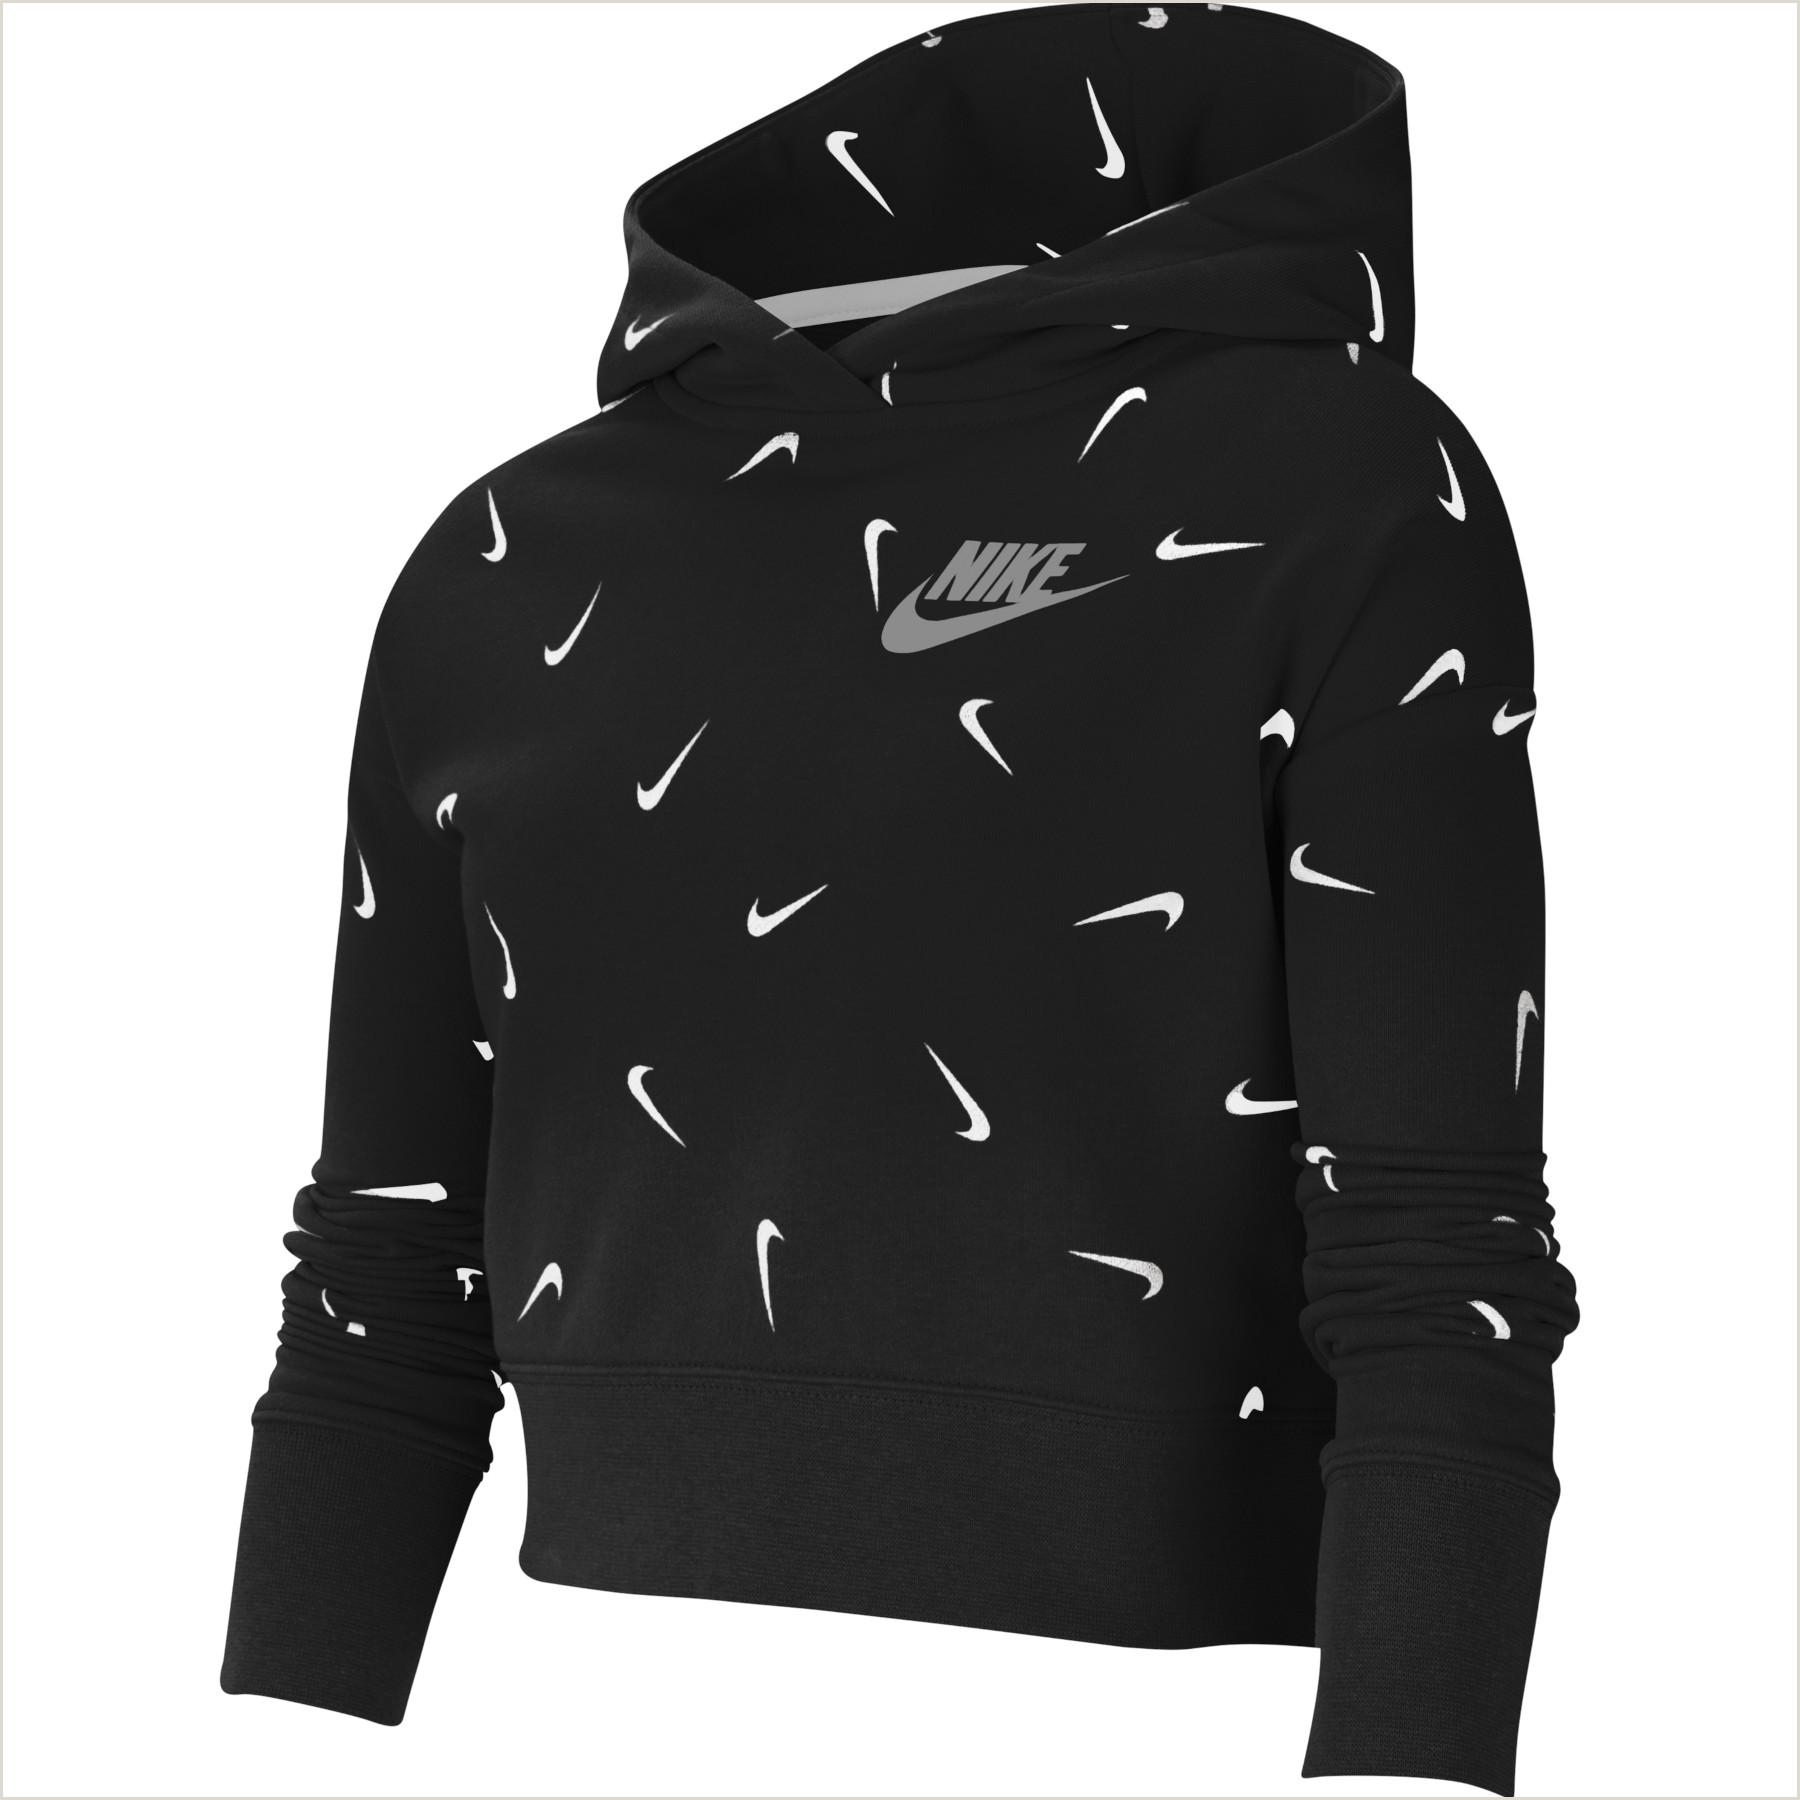 Credit Card Logos Black And White Nike Sportswear Girls Printed Cropped Hoo Black White Light Smoke Grey Cz2566 010